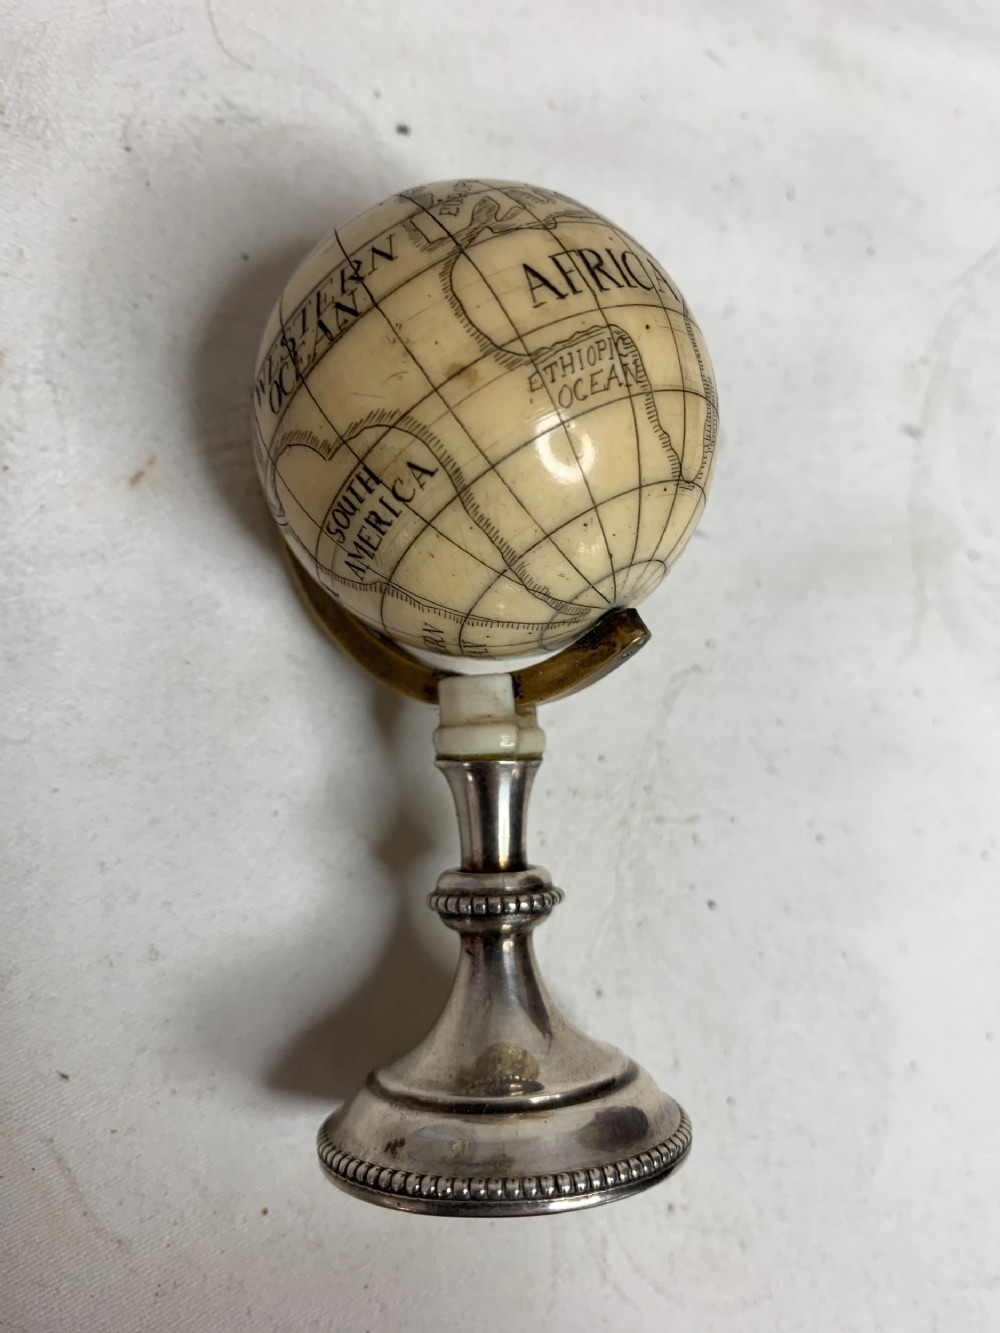 miniature ivory and silver globe 4cm diameter